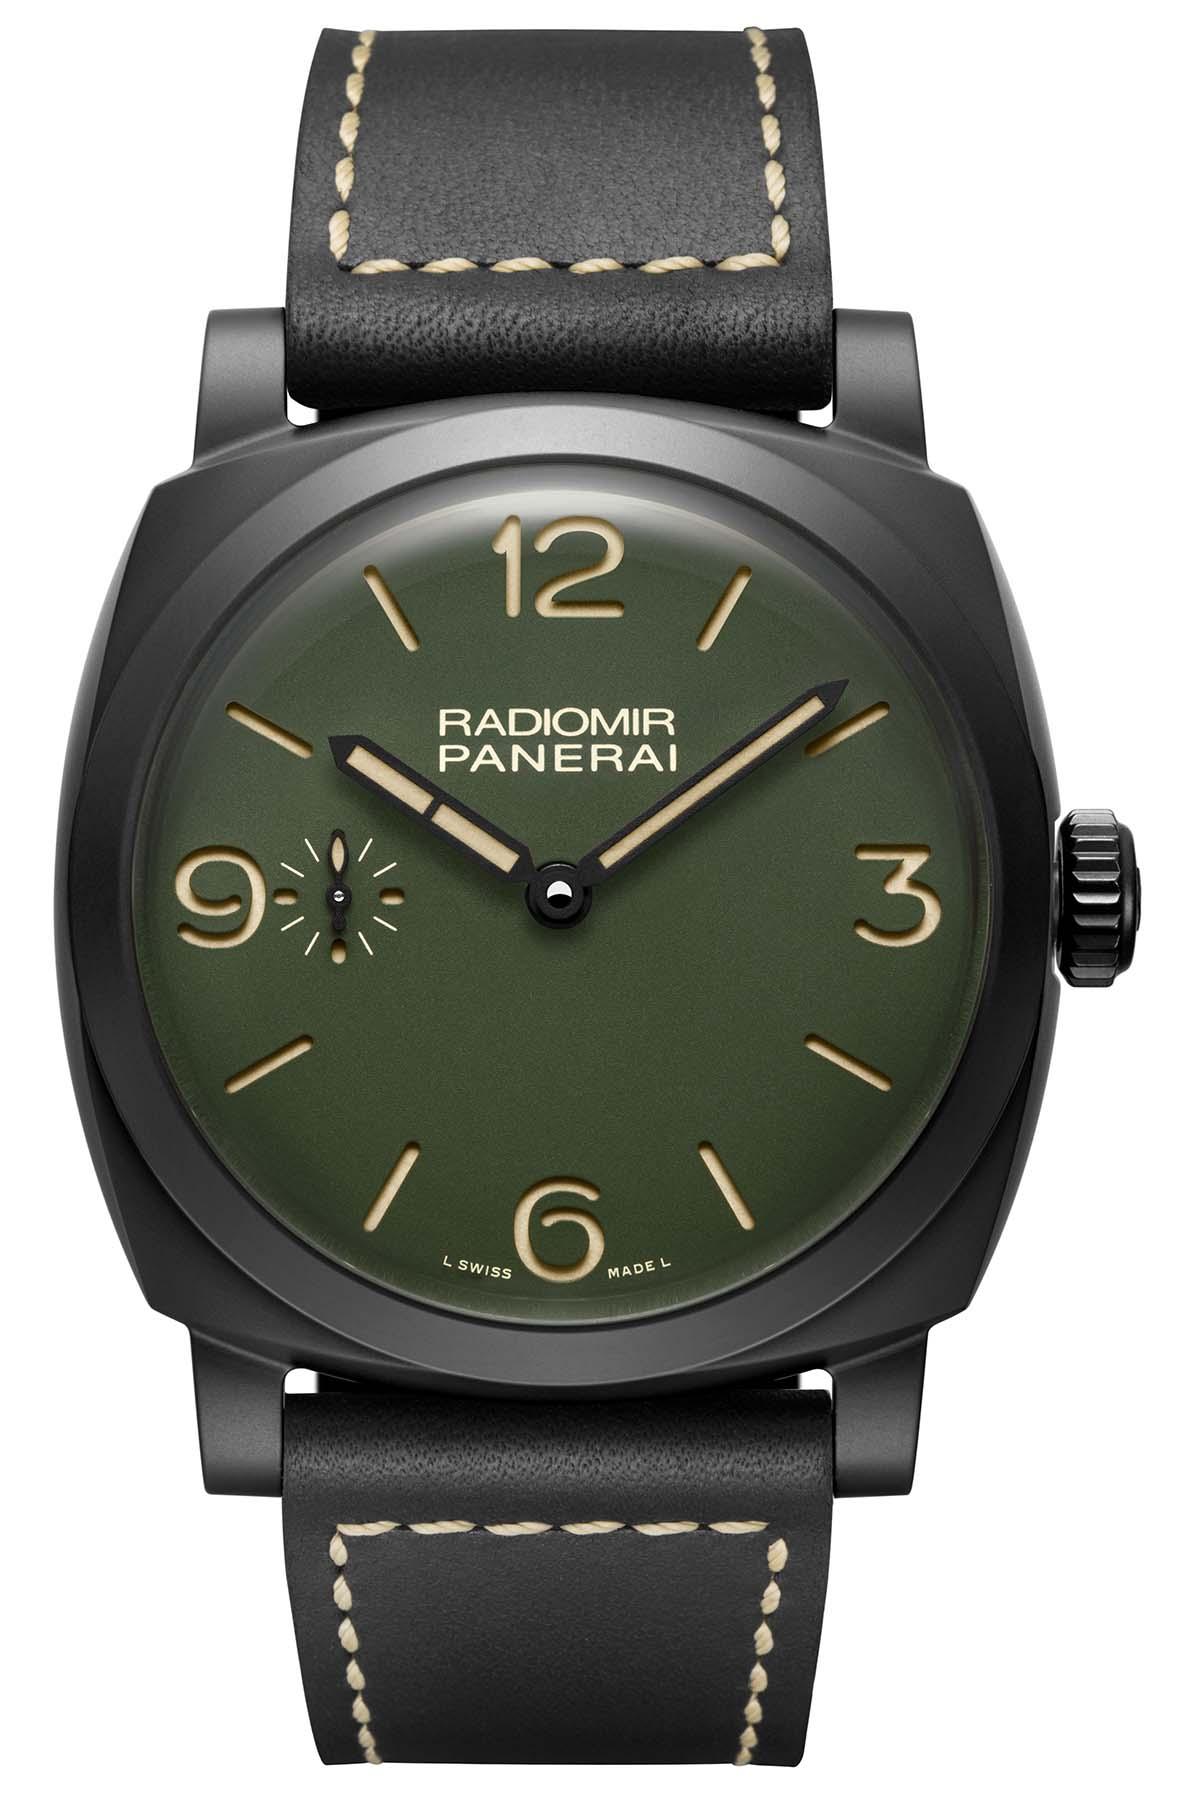 Panerai Radiomir 1940 48mm ceramic military green PAM00997